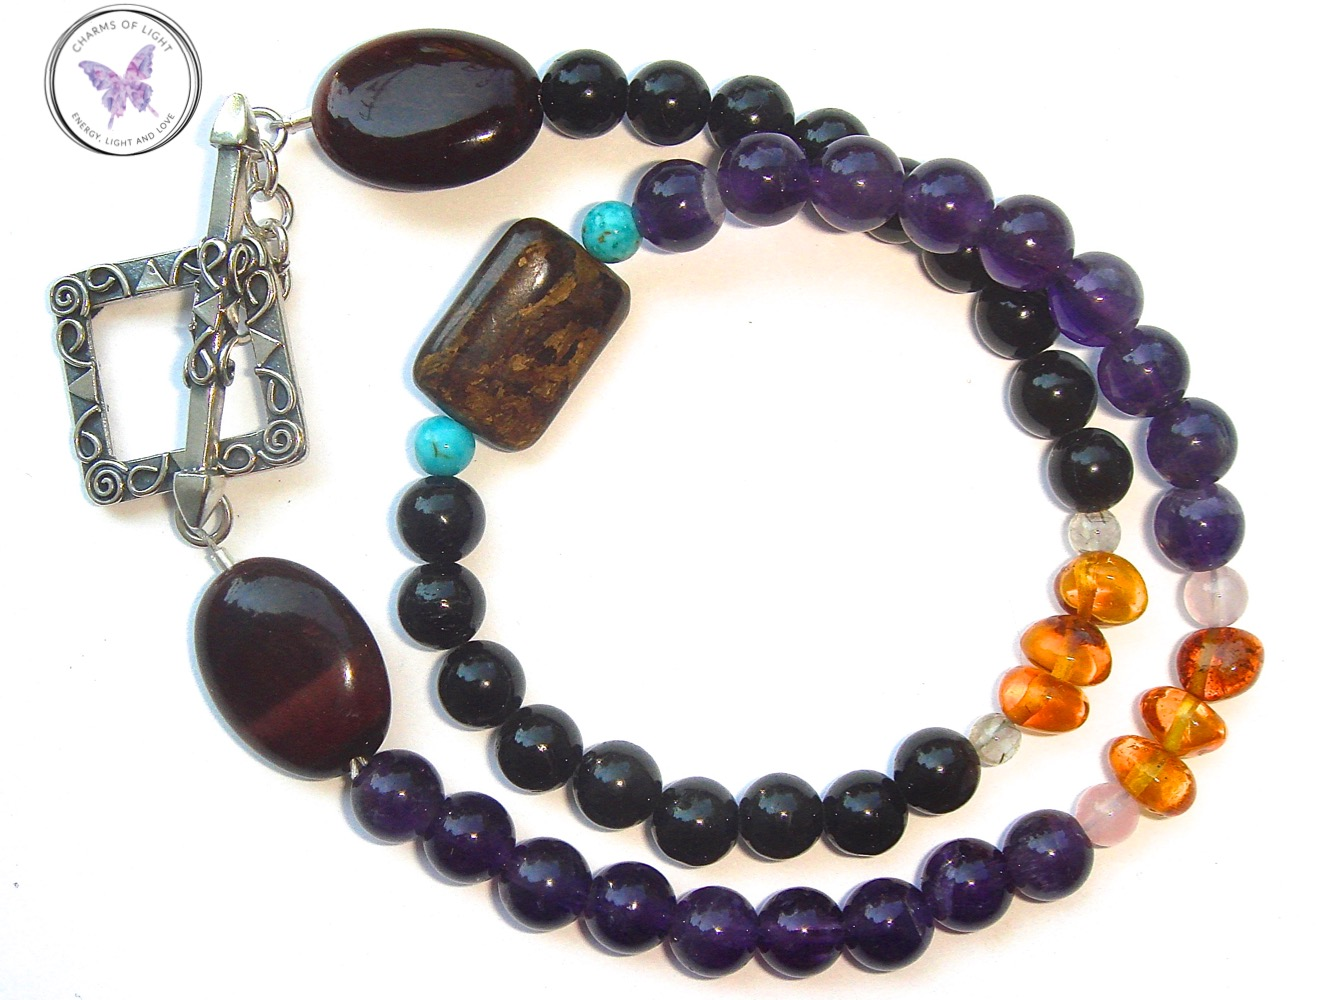 Healing Jewellery